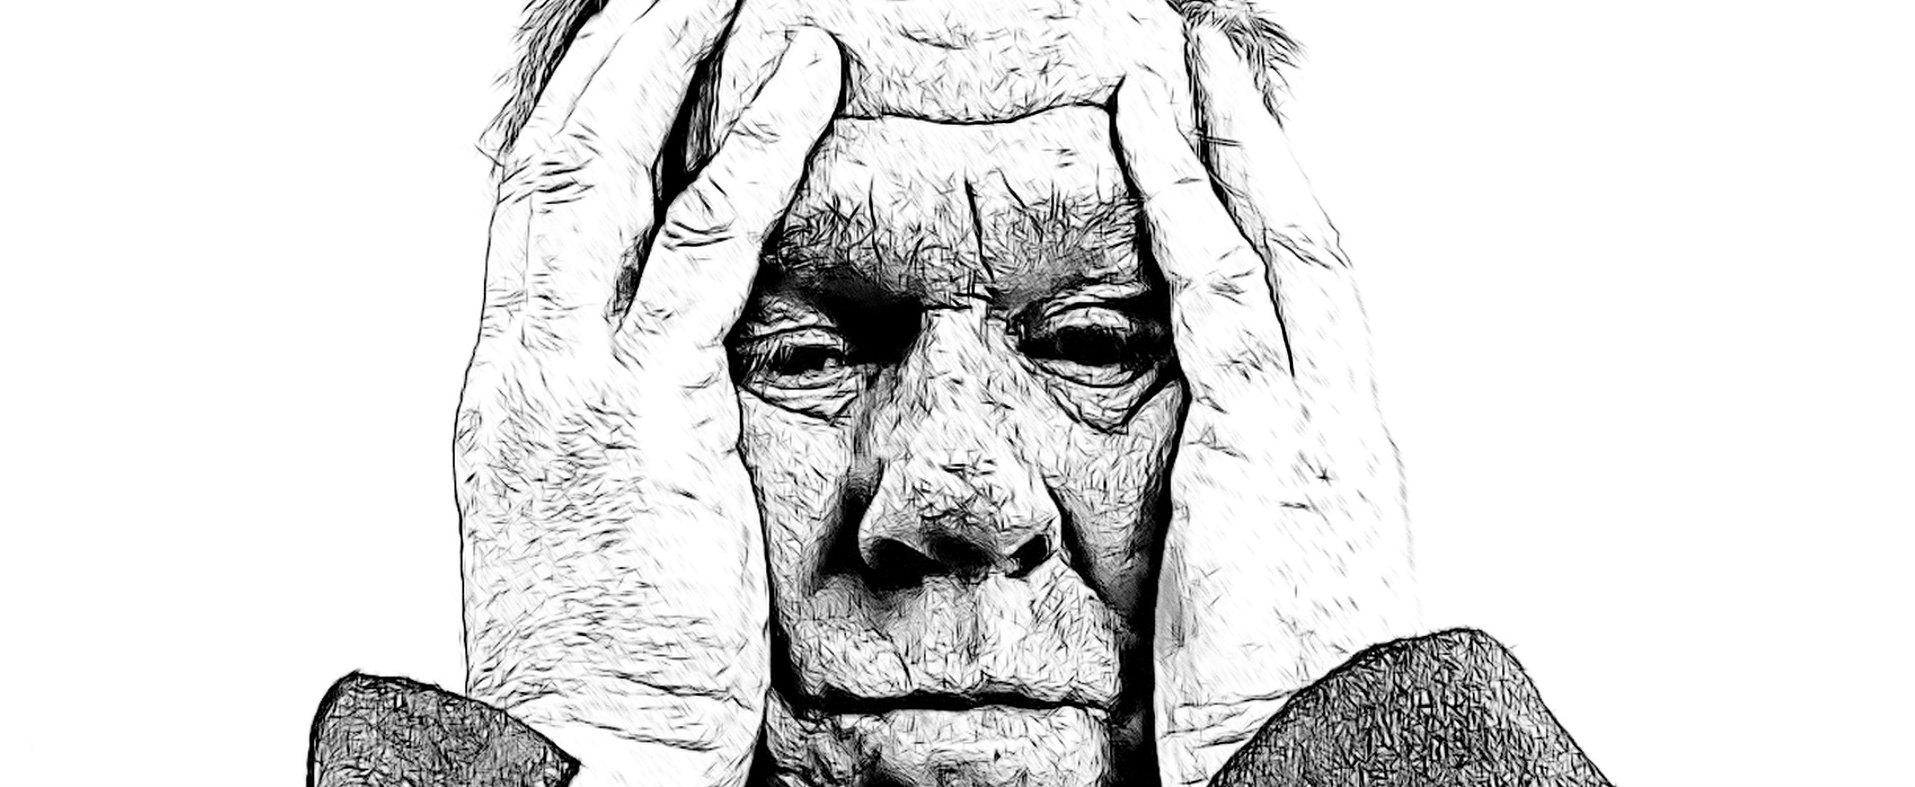 Dolore, senno, problema, paradosso, Psicologo